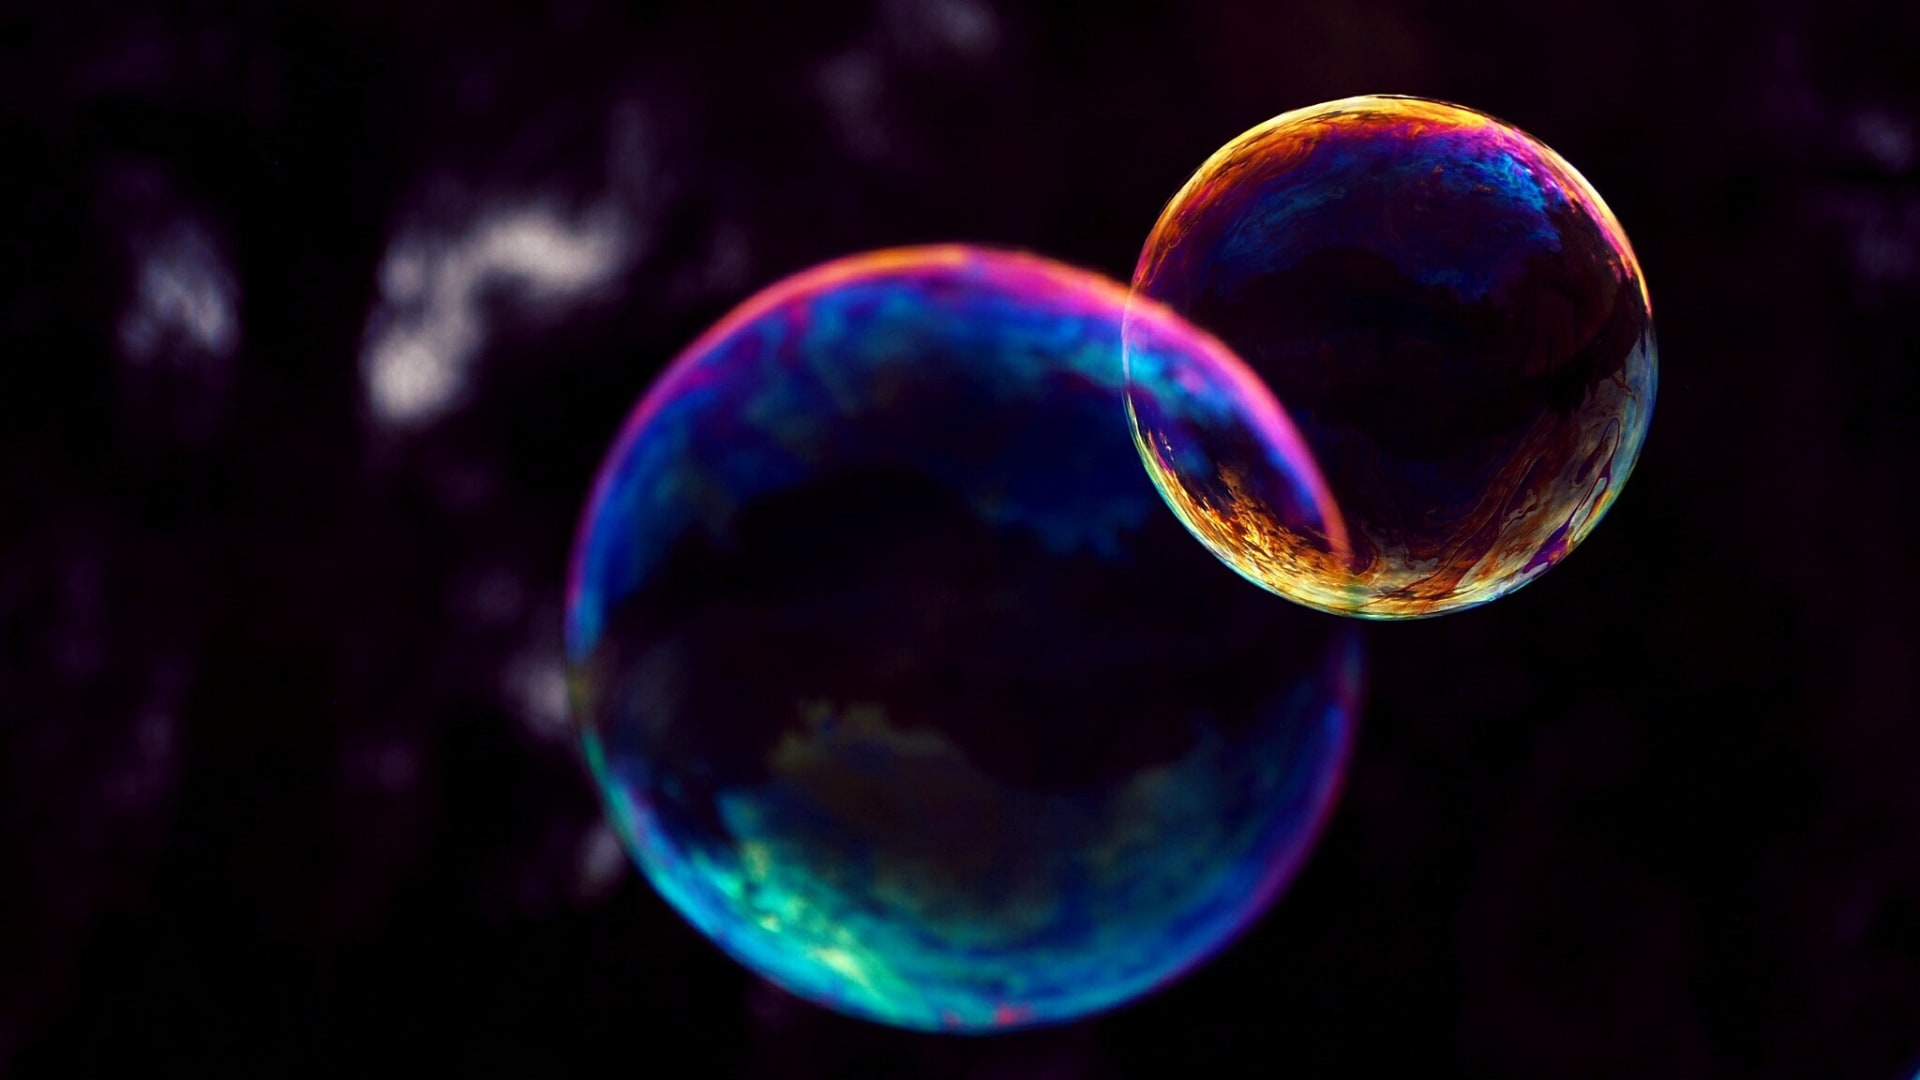 NFT will the bubble burst?